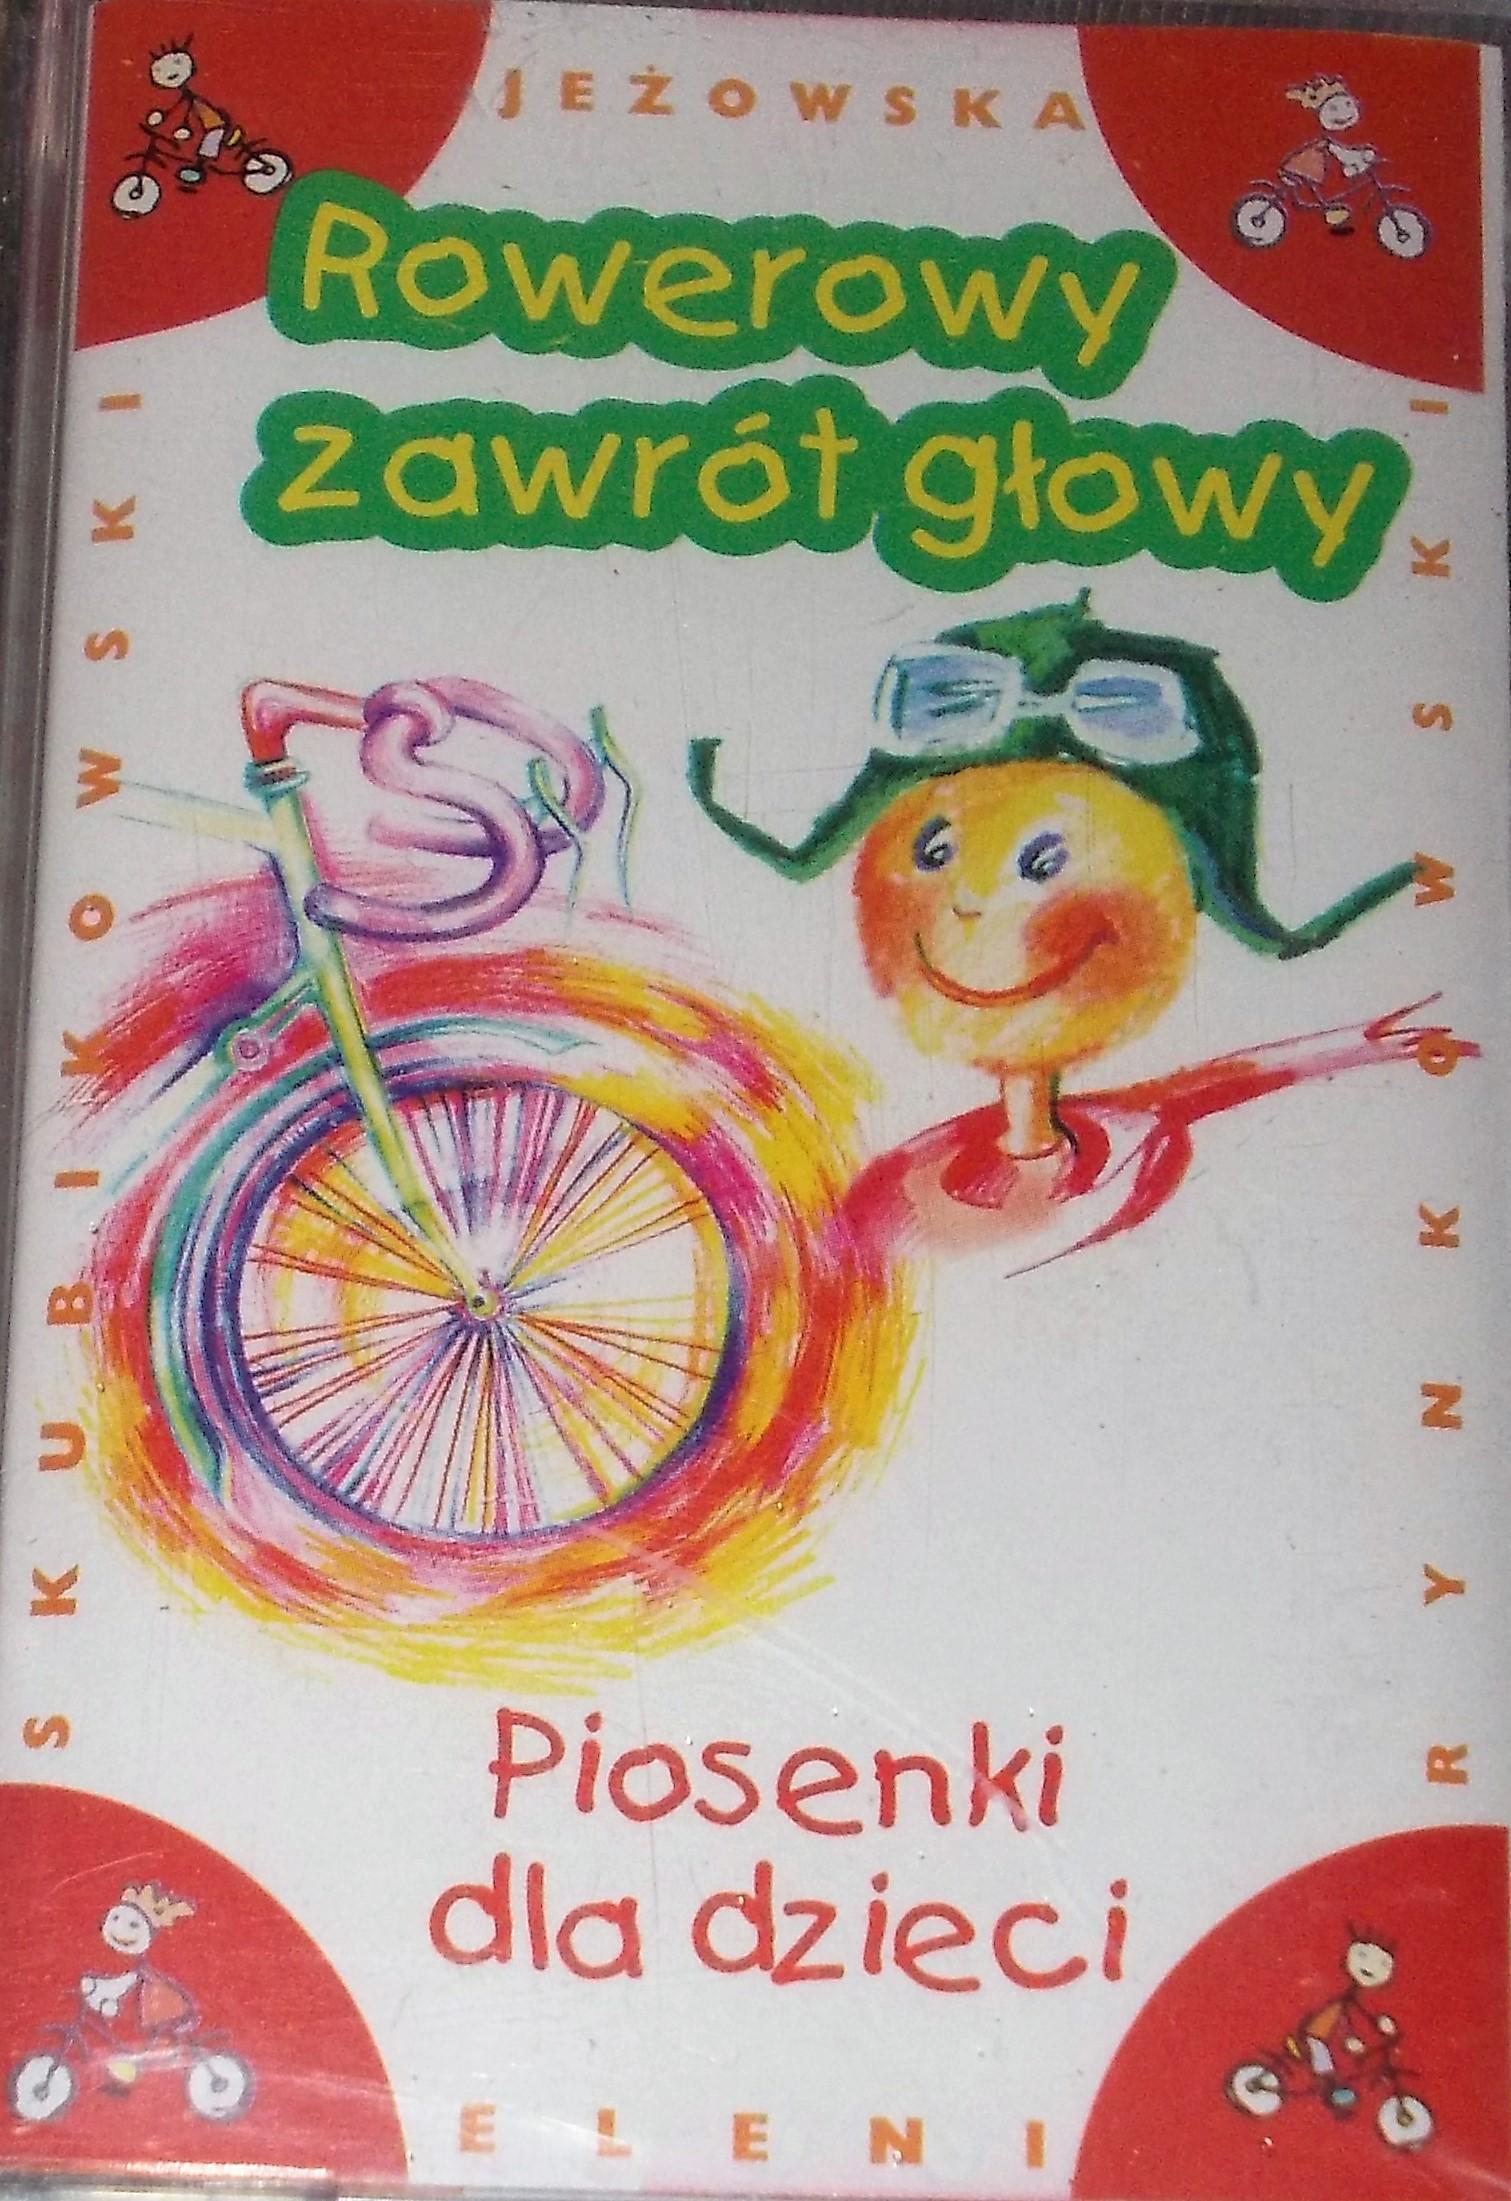 Item Jeżowska, Skubikowski and other cassette new STARLING